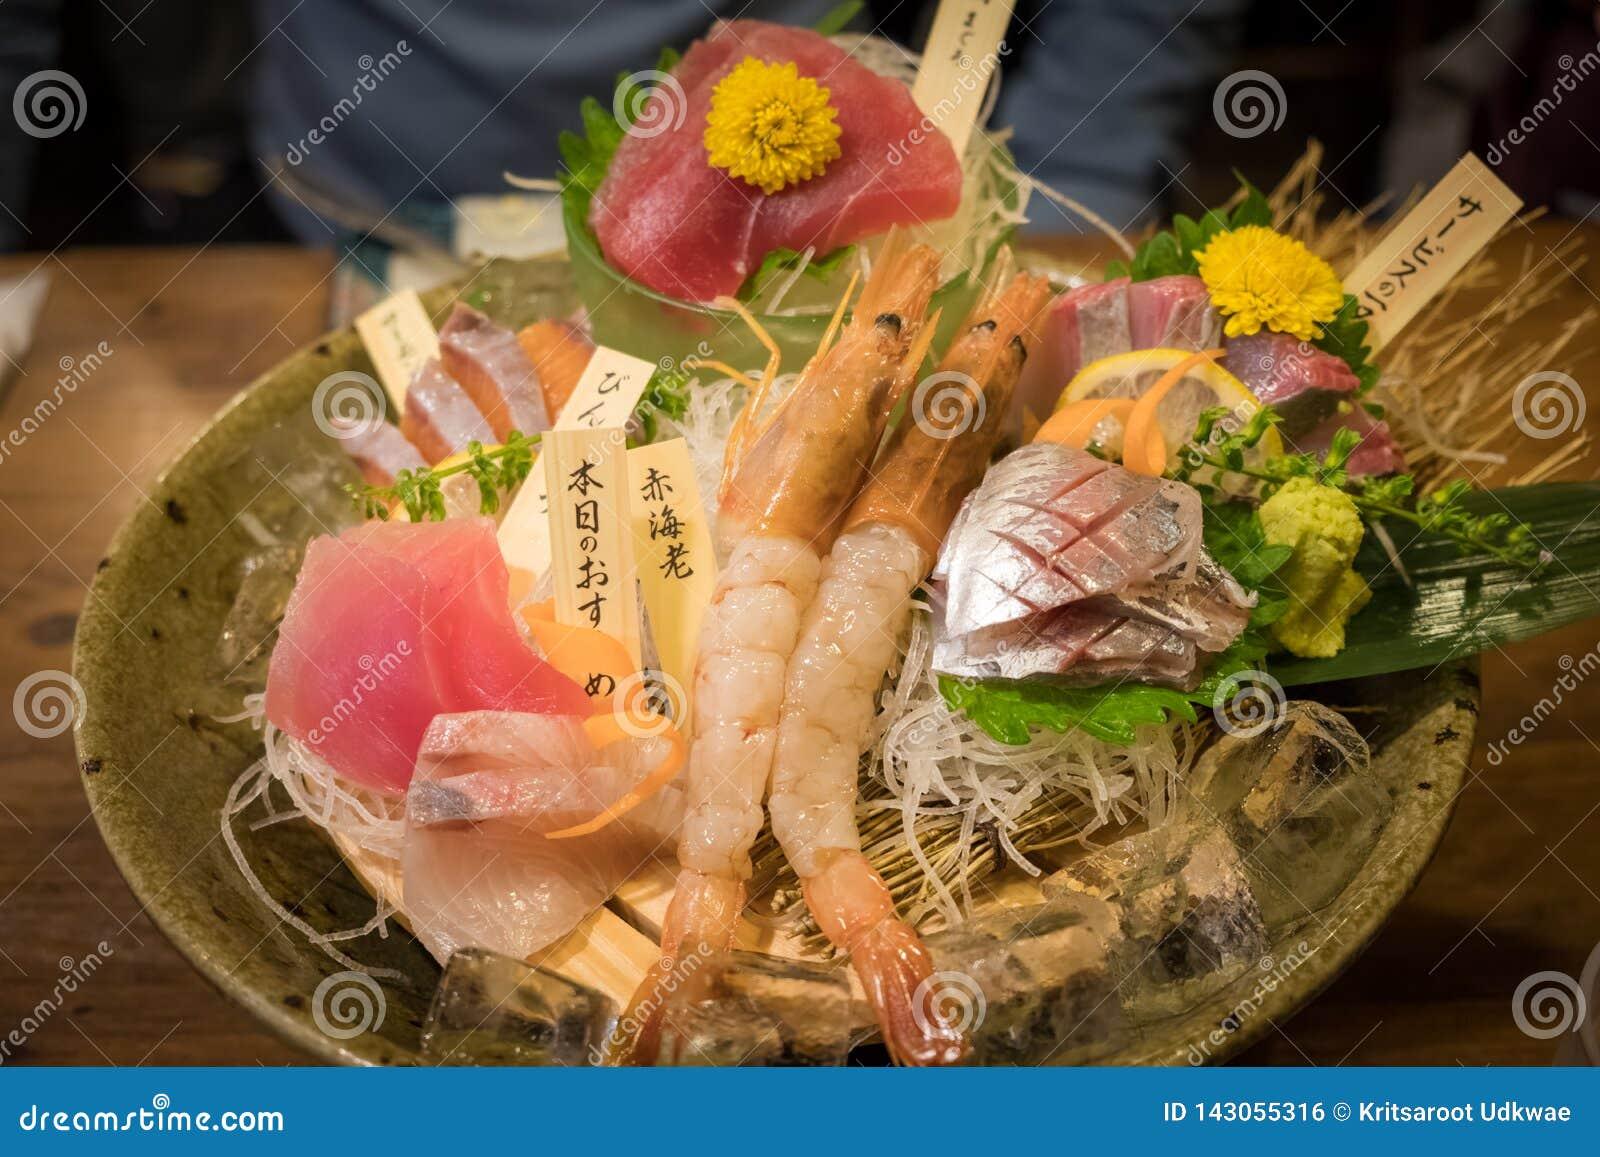 Premium sashimi, mix raw seafood on bowl at Japanese restaurant.